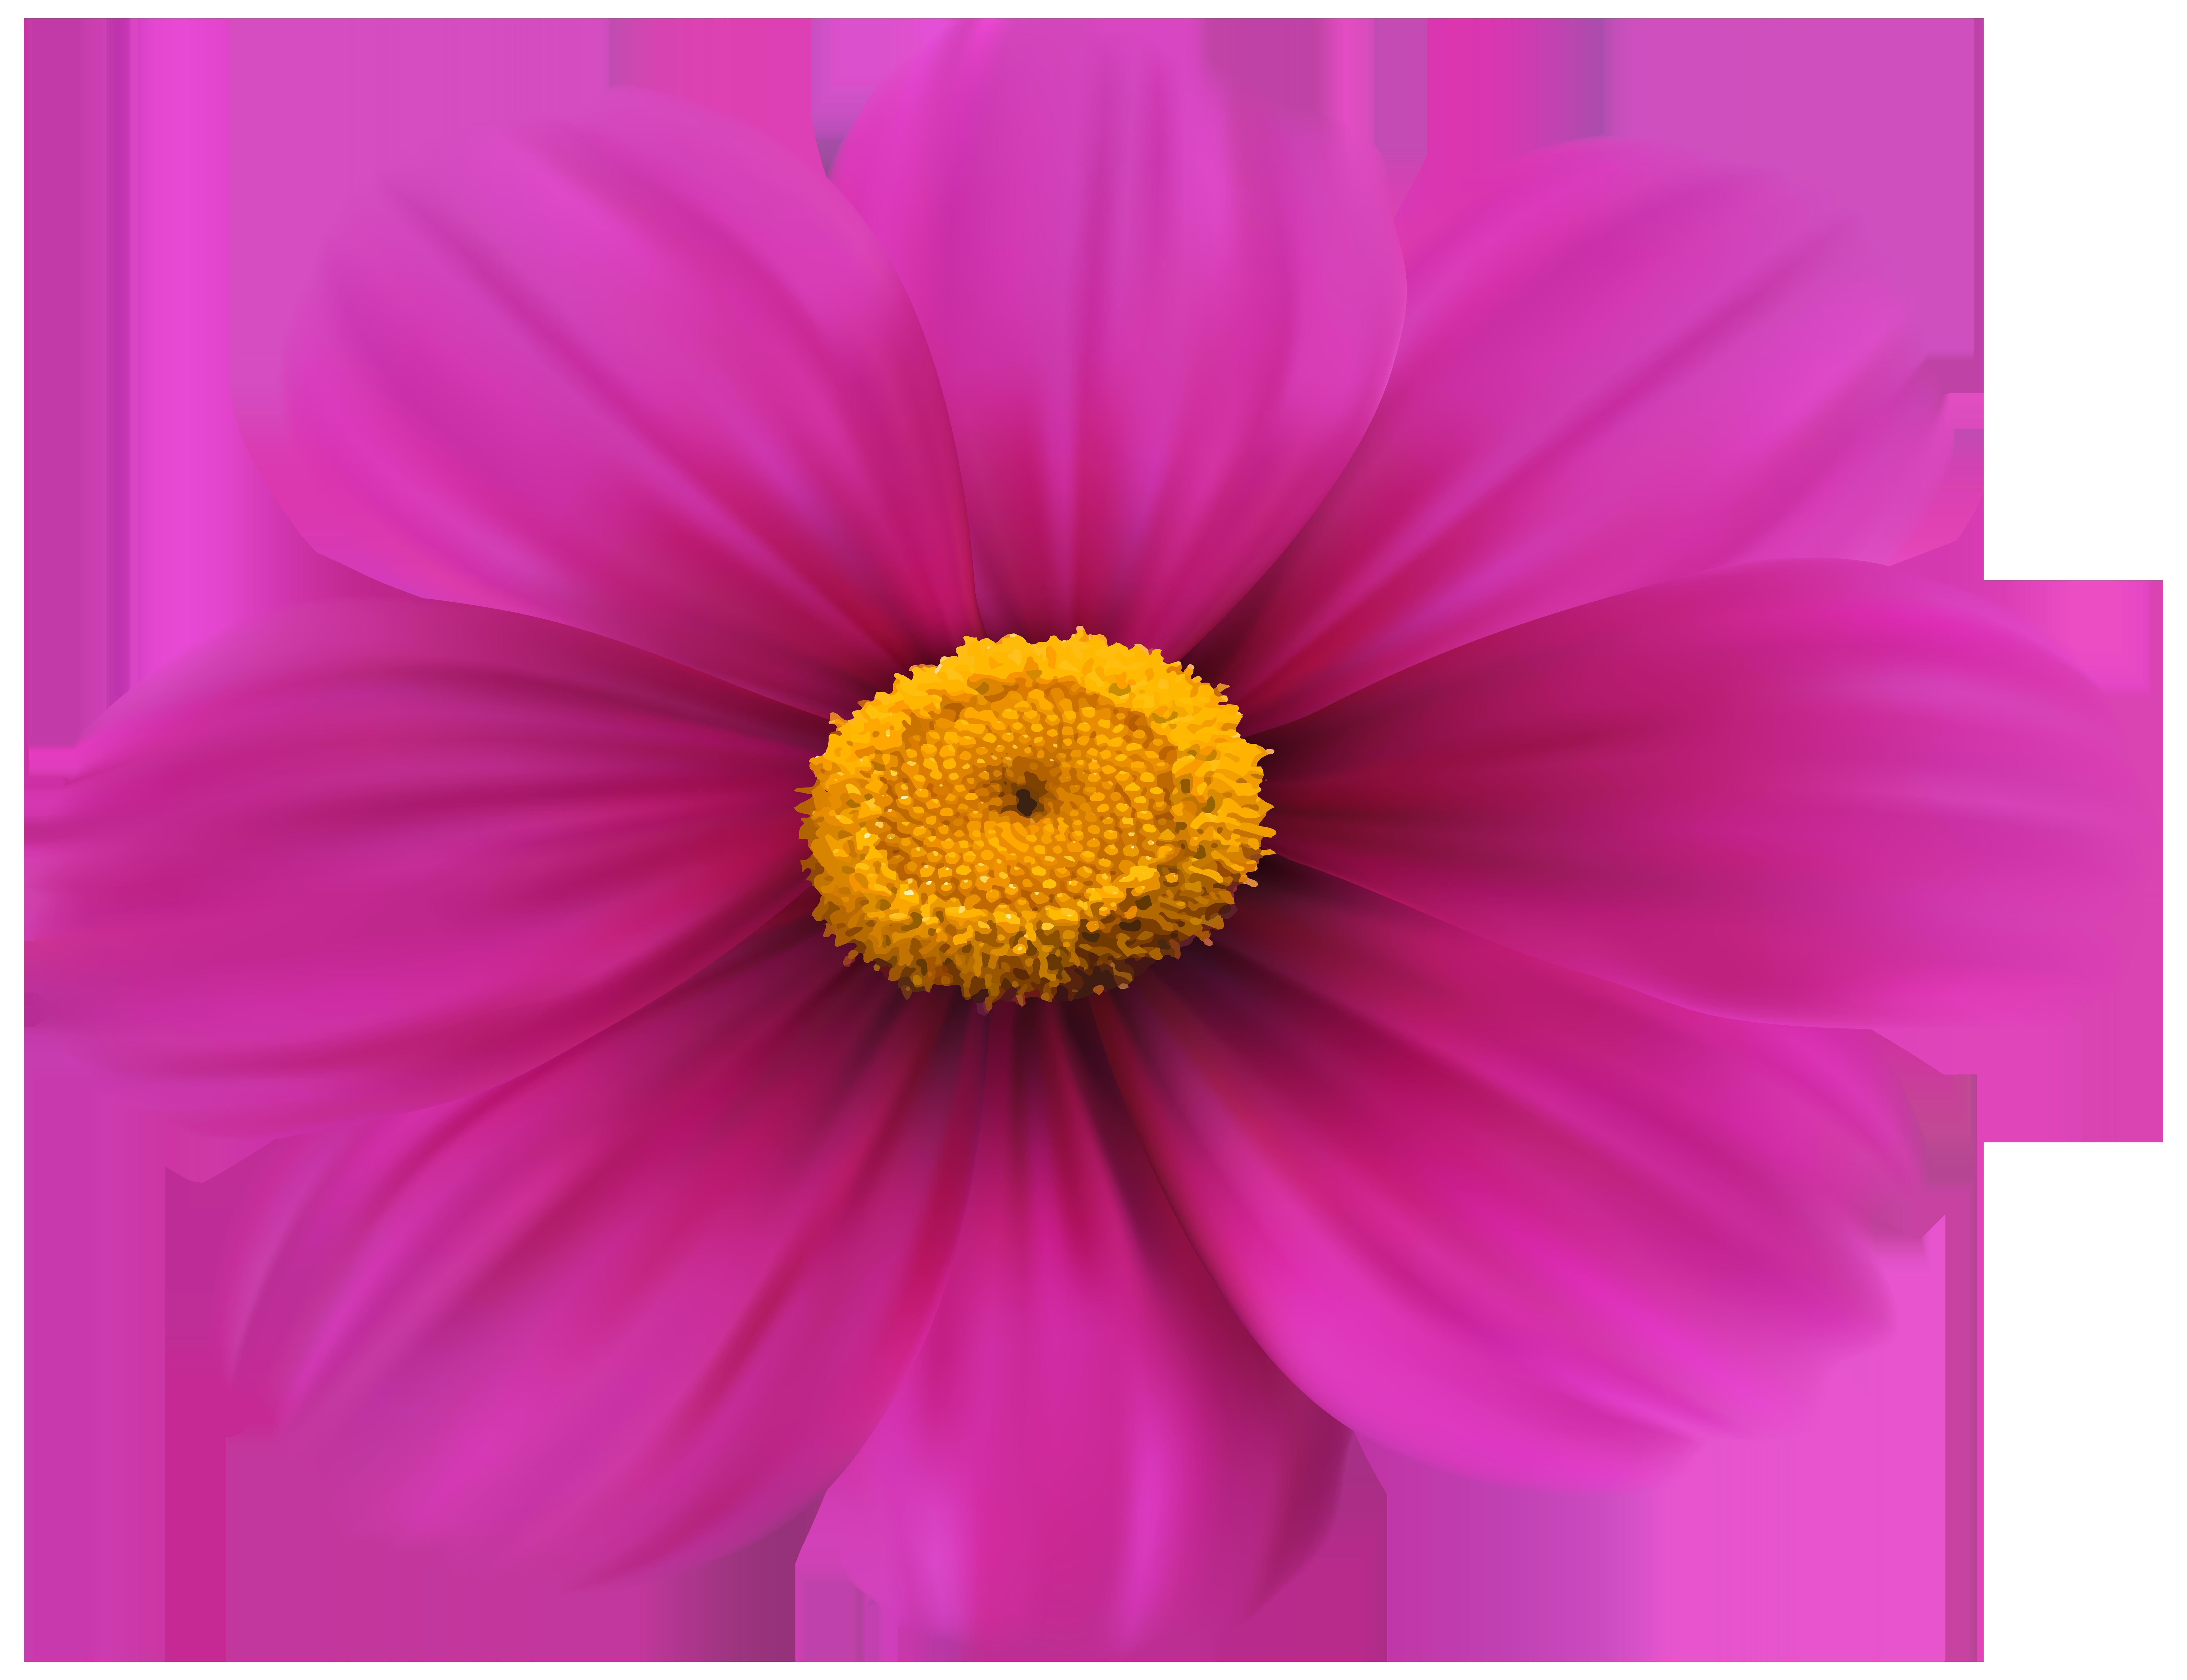 Flowers clipart money. Flower magenta purple violet